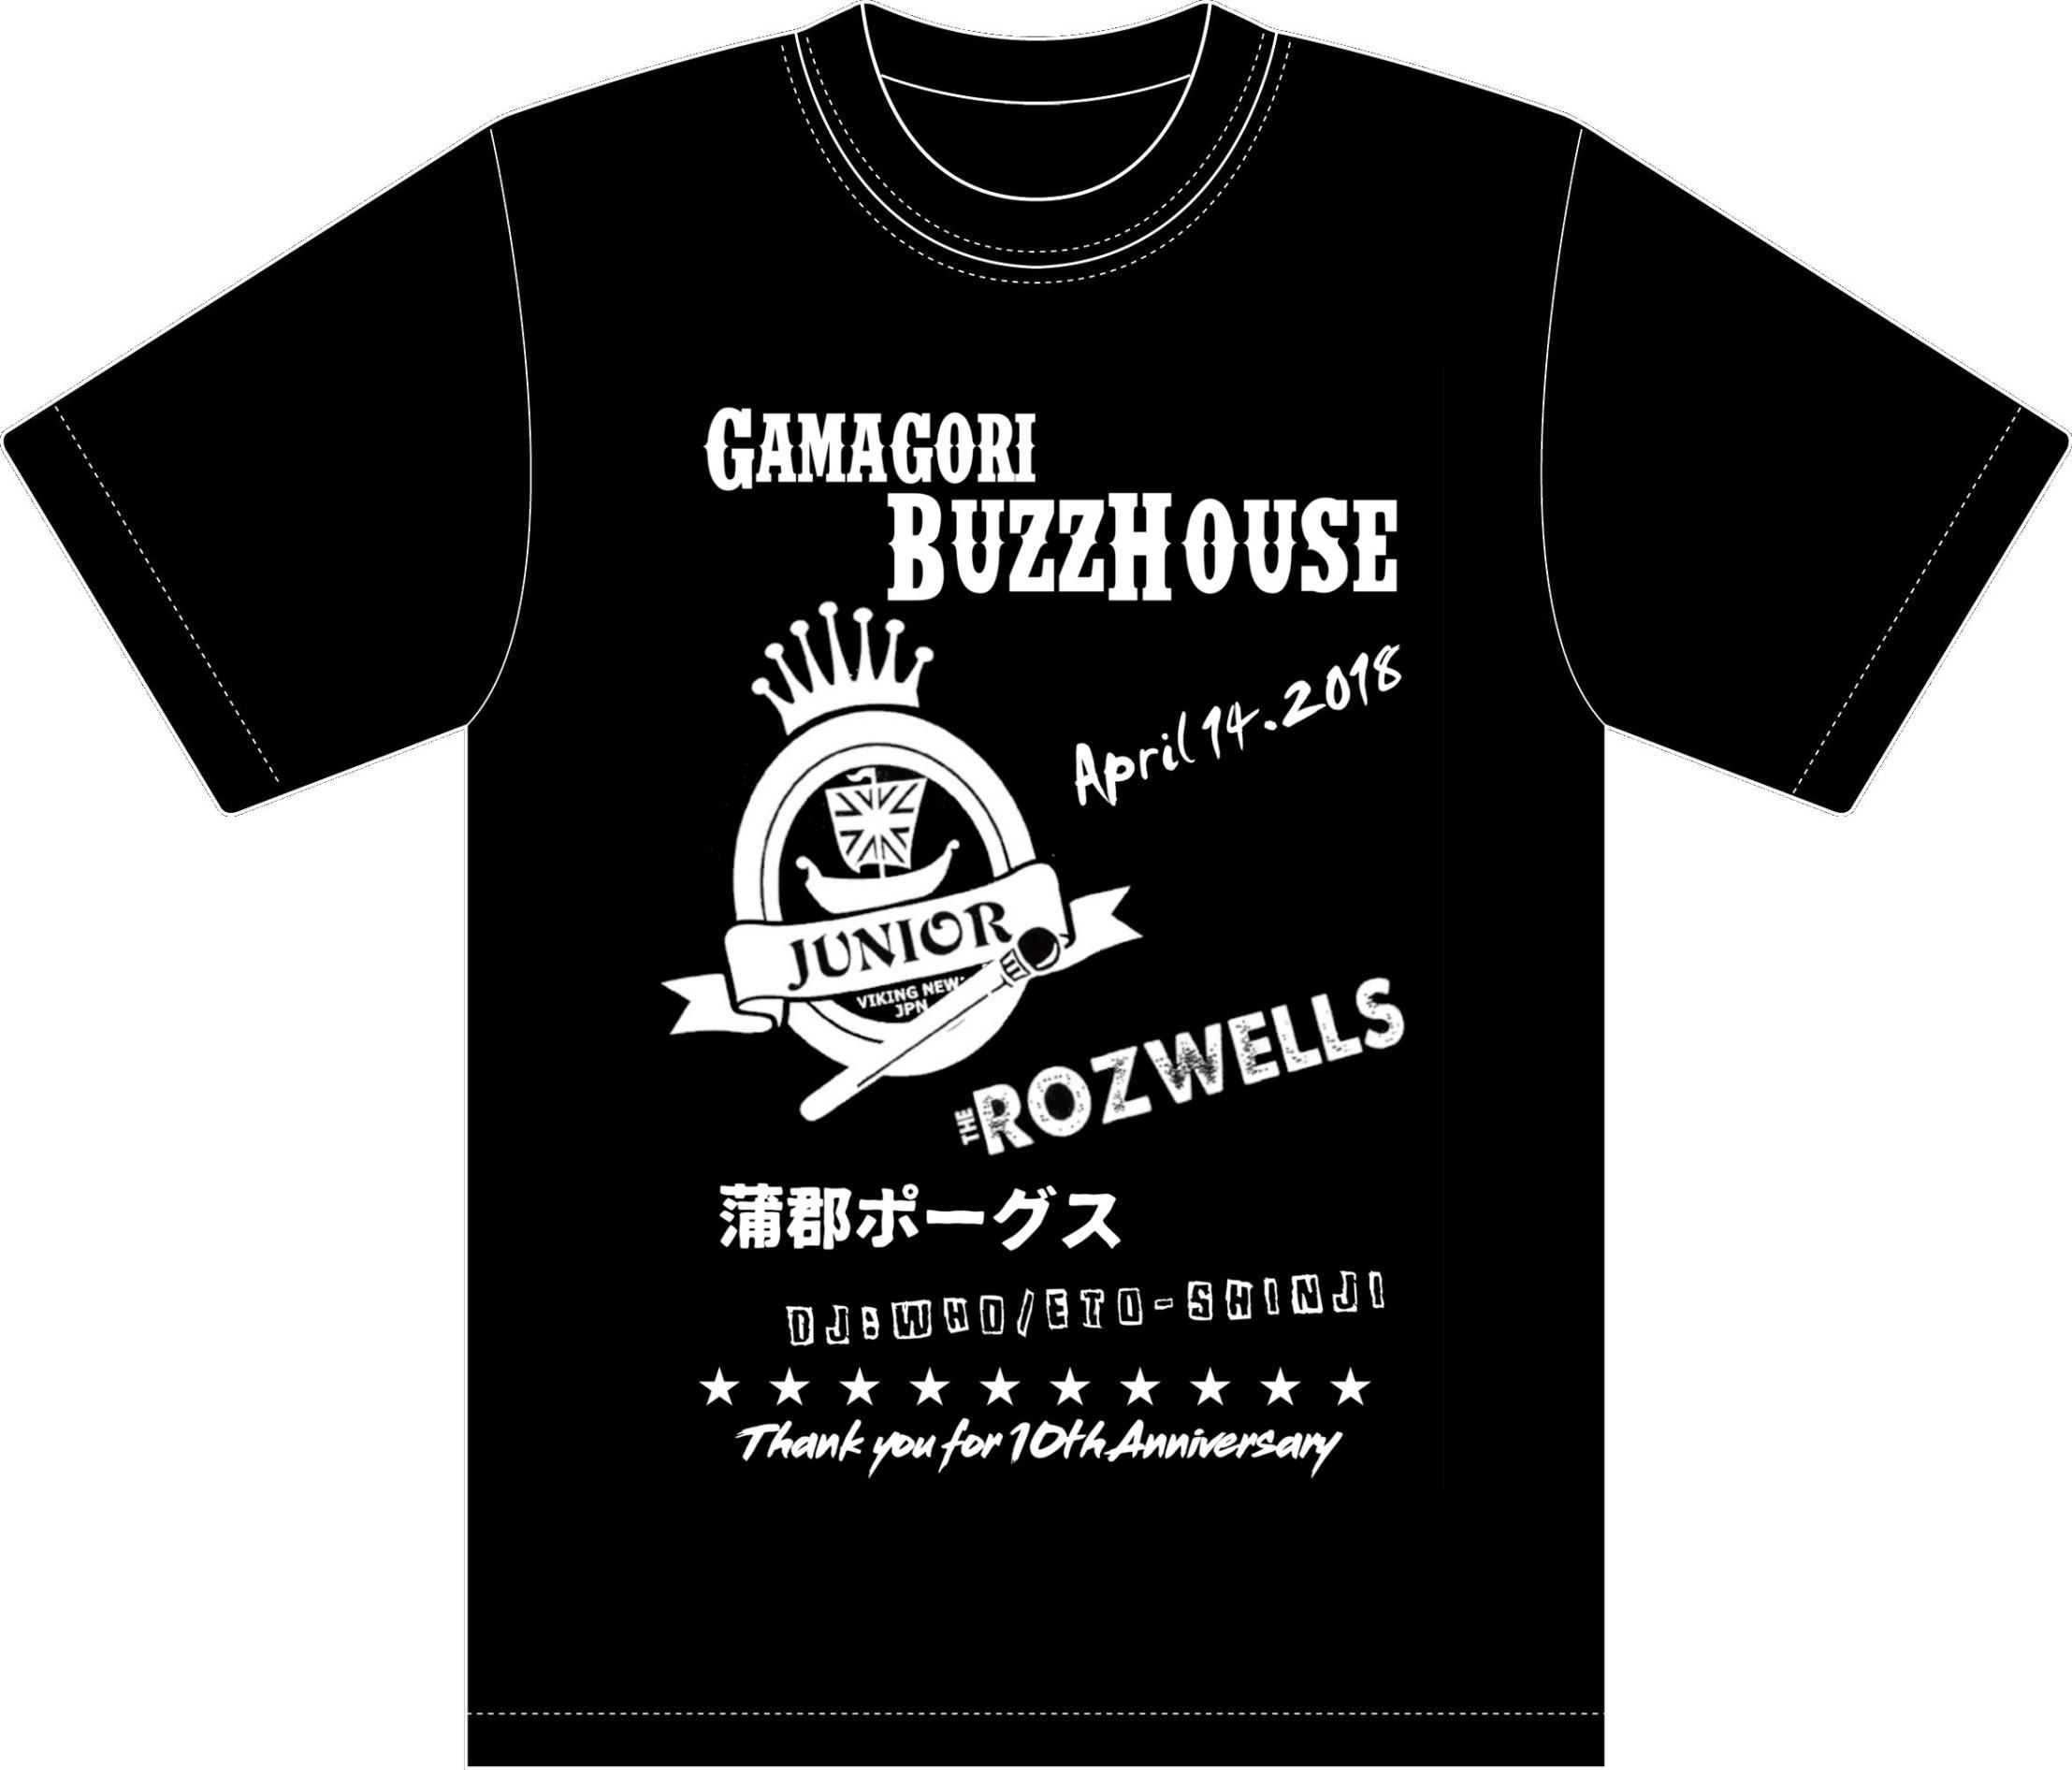 "\""GAMAGORI BUZZ HOUSE PRESENT ~TENTH ANNIVERSARYT PARTY~ \""BUSY!BUSY!!BUSY!!!\""  イベントTシャツ発売決定!\""  _b0123708_07510504.jpg"